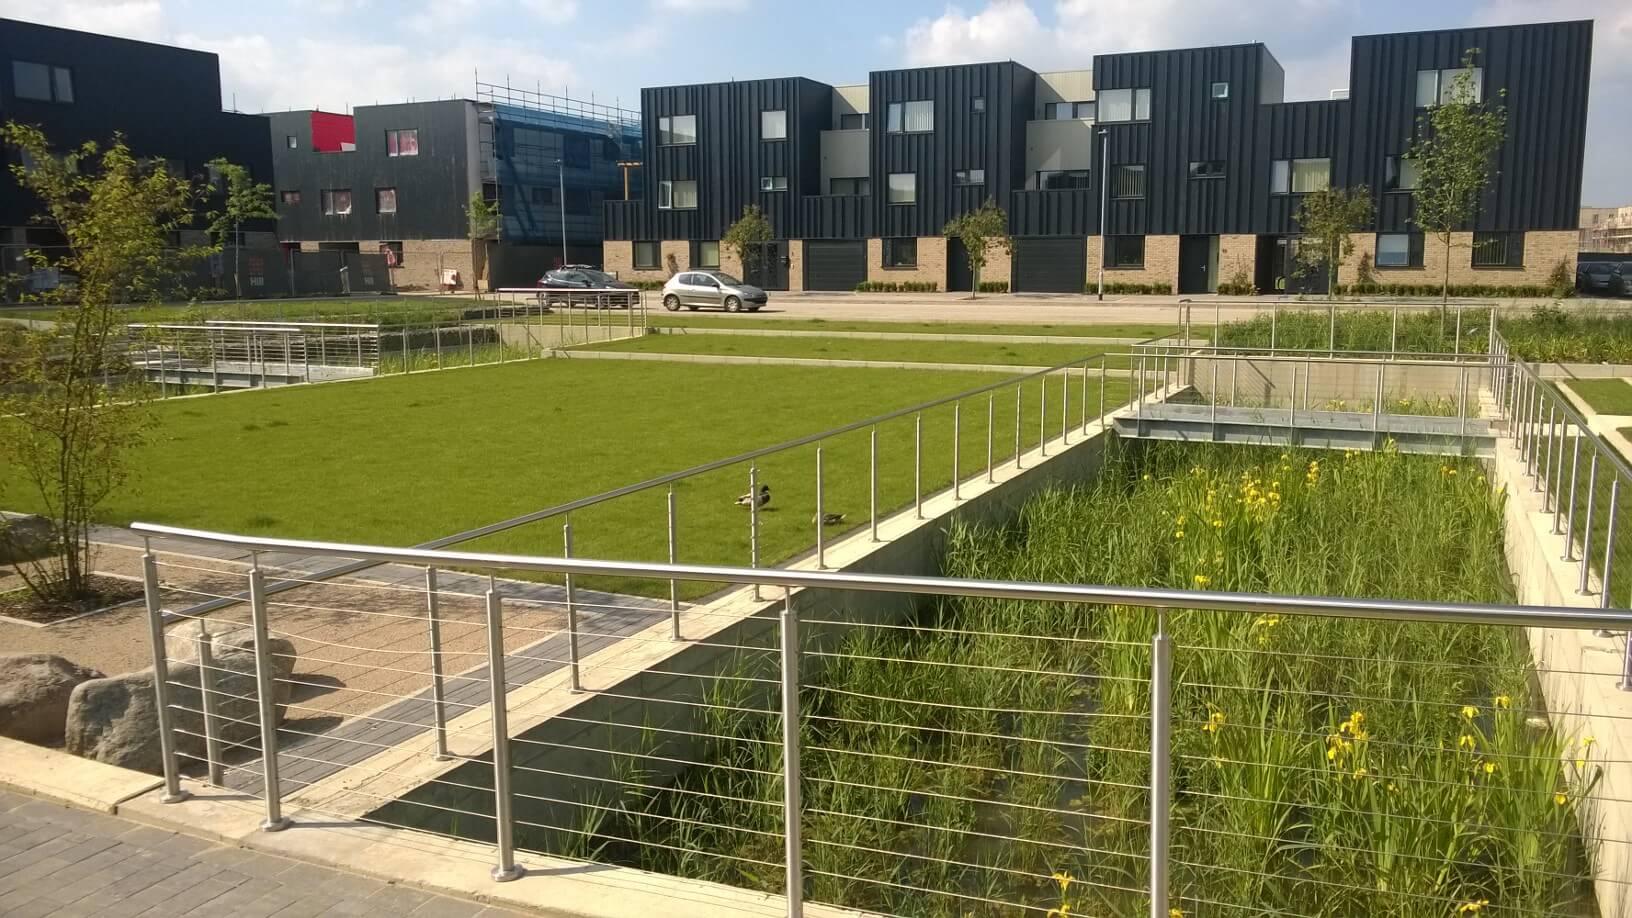 Cambridge – Clay Farm (The Quad 2013)